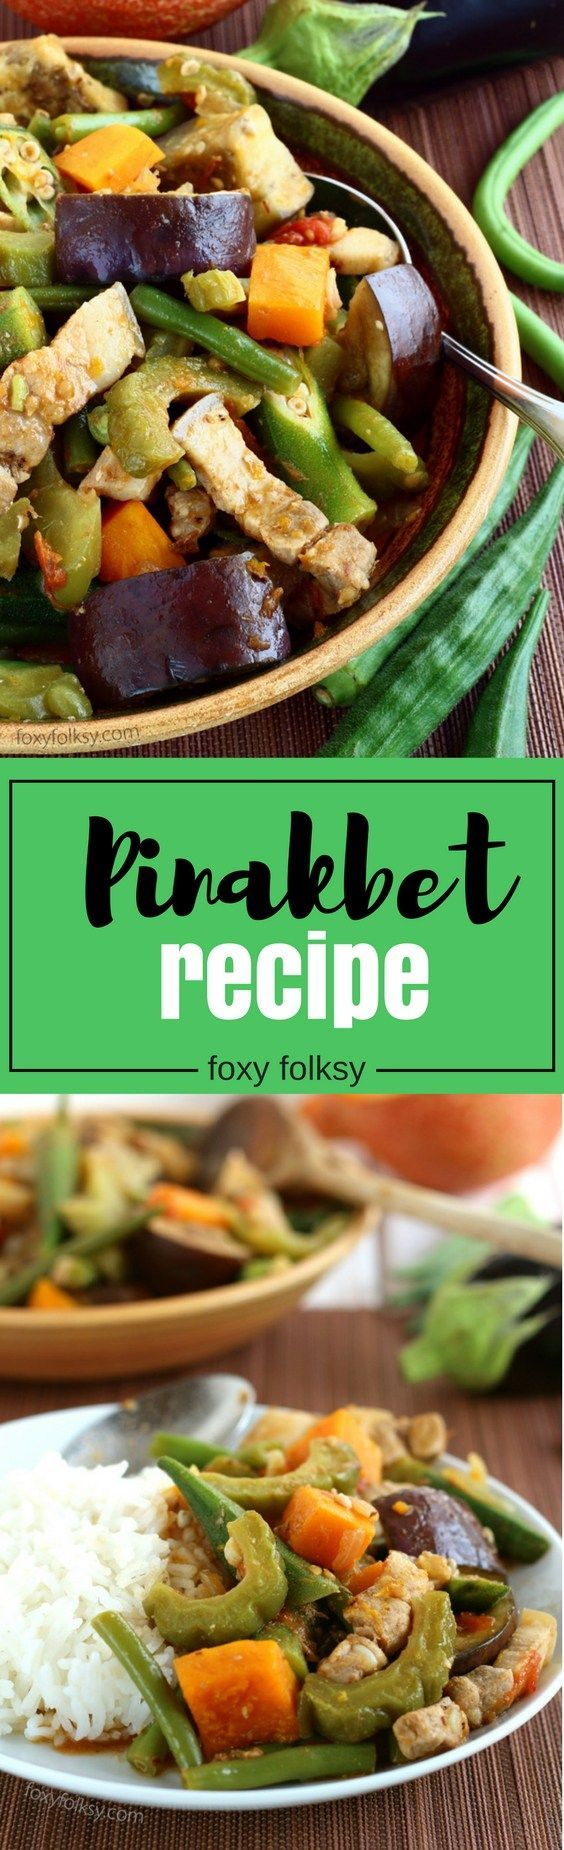 Pinakbet (Pakbet) | Foxy Folksy